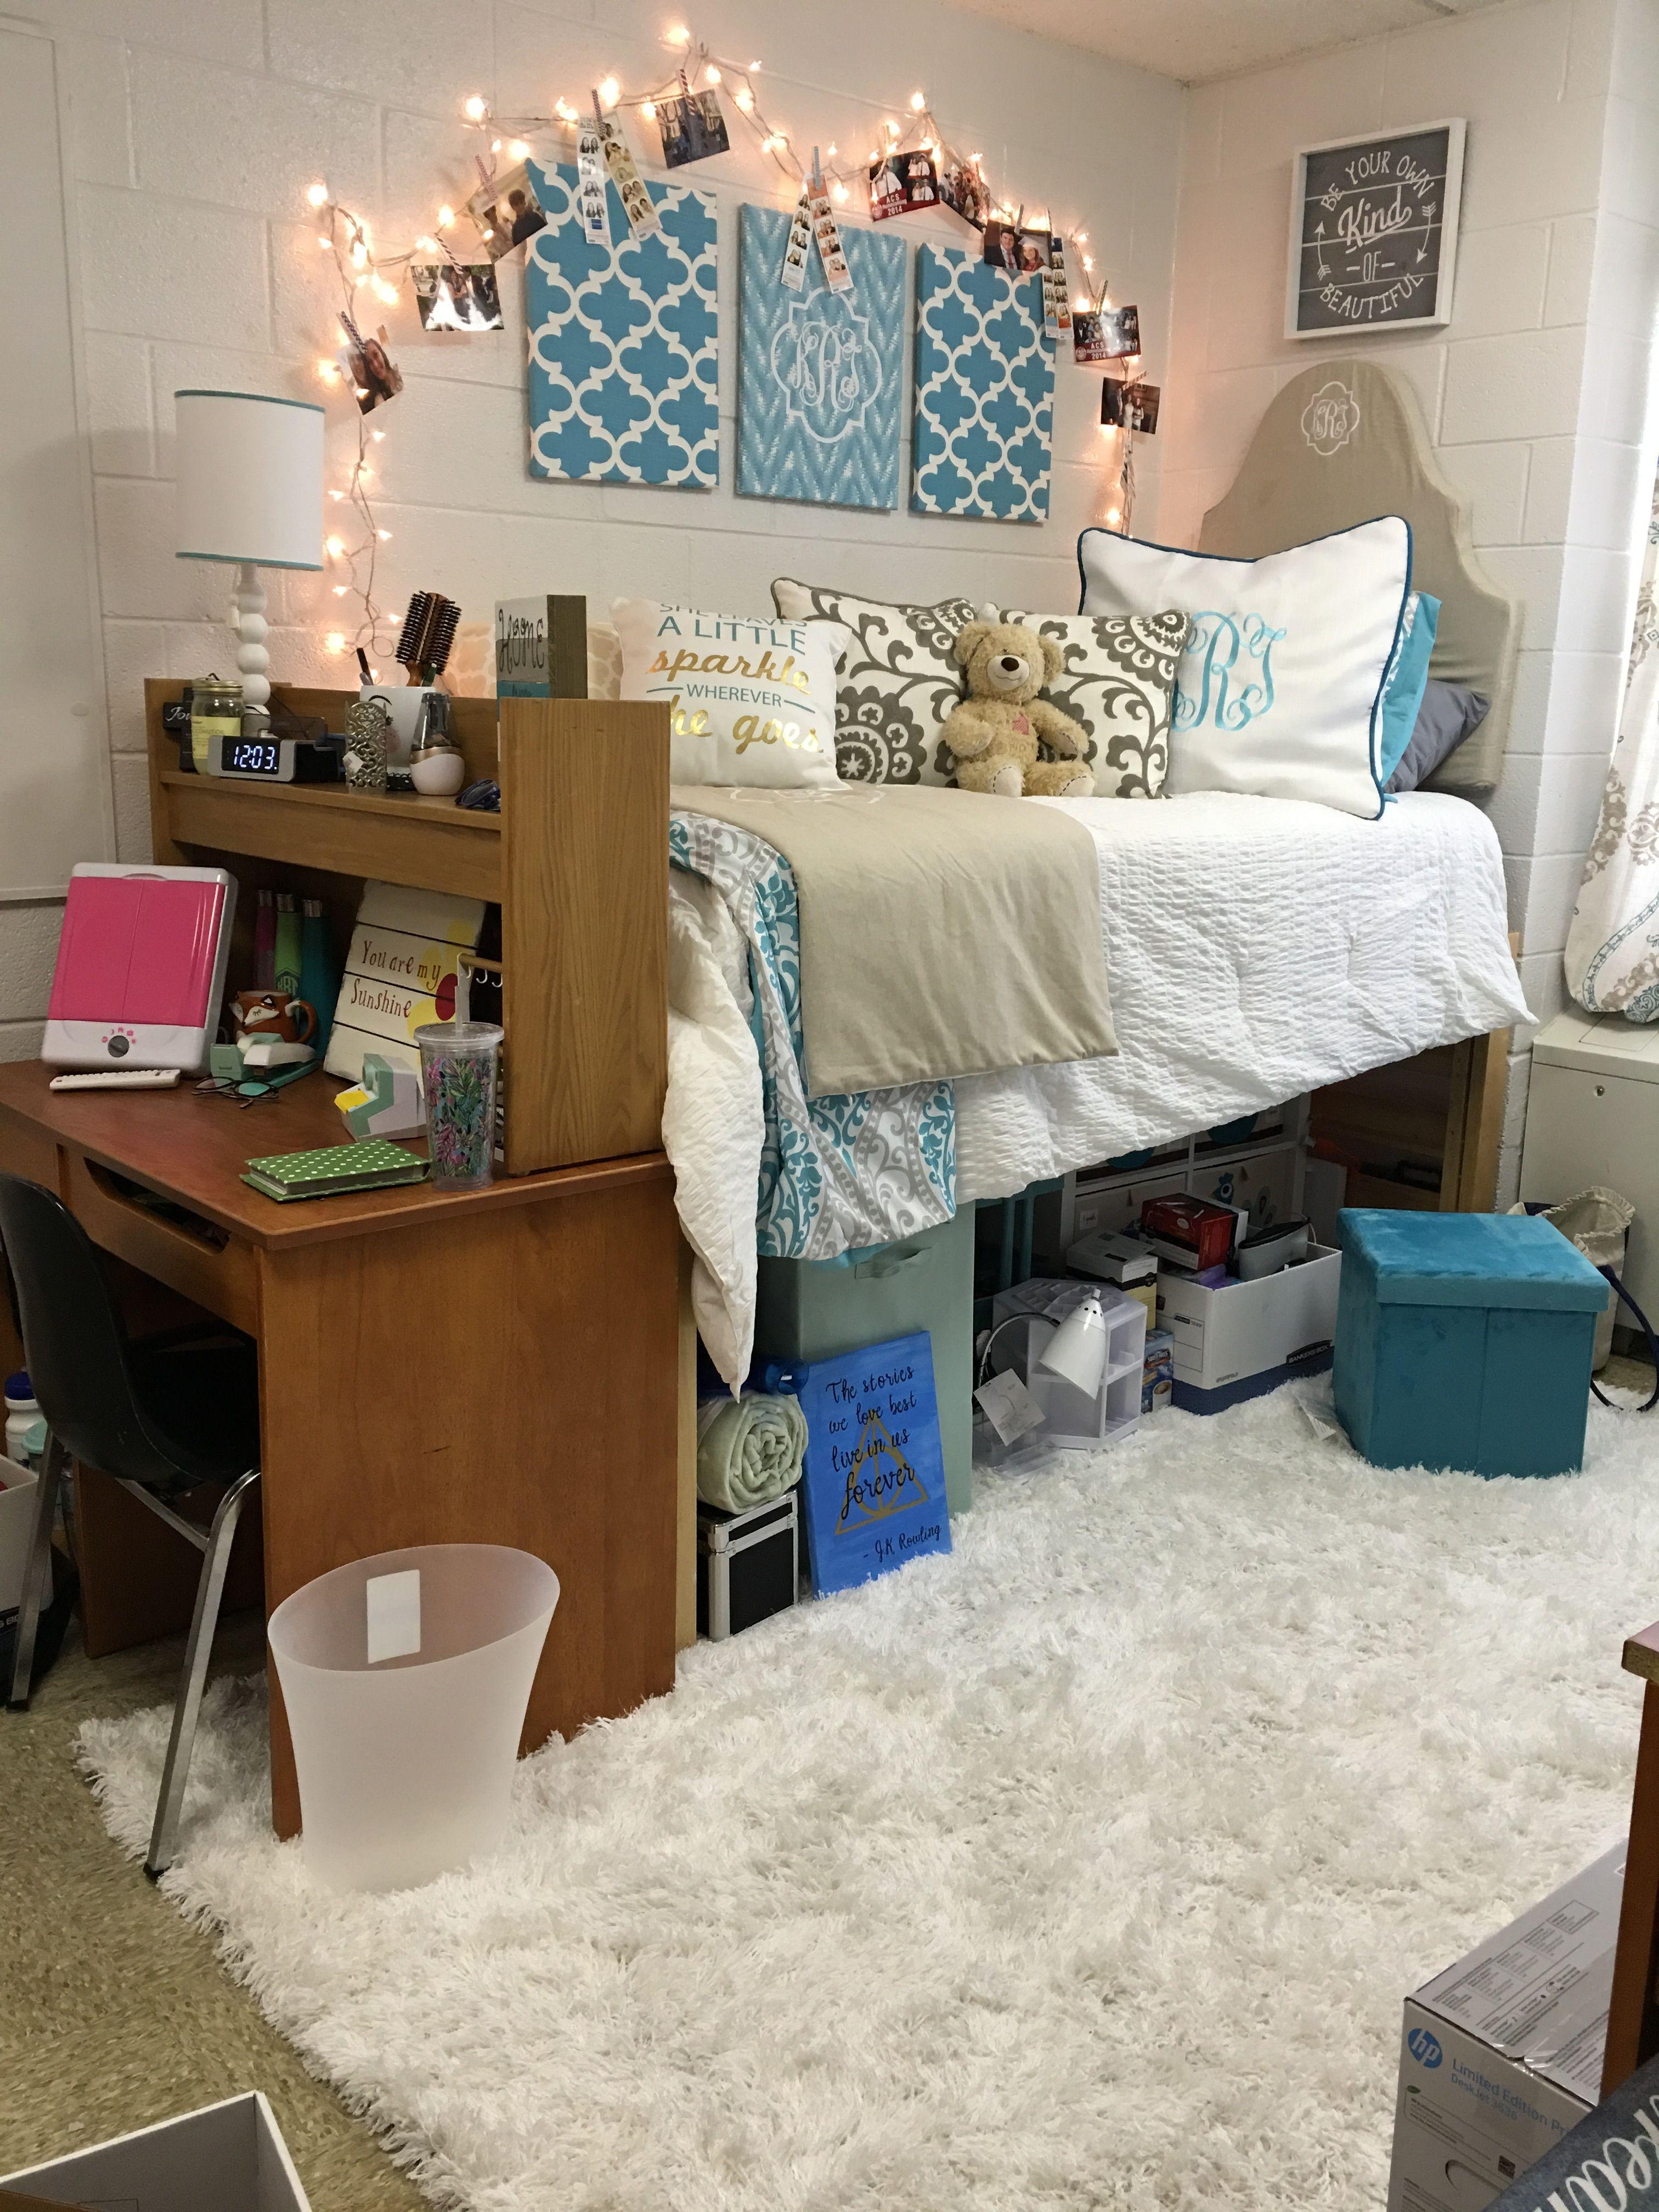 Reinhardt University Dorm Room 2016 Gordy Hall We Made